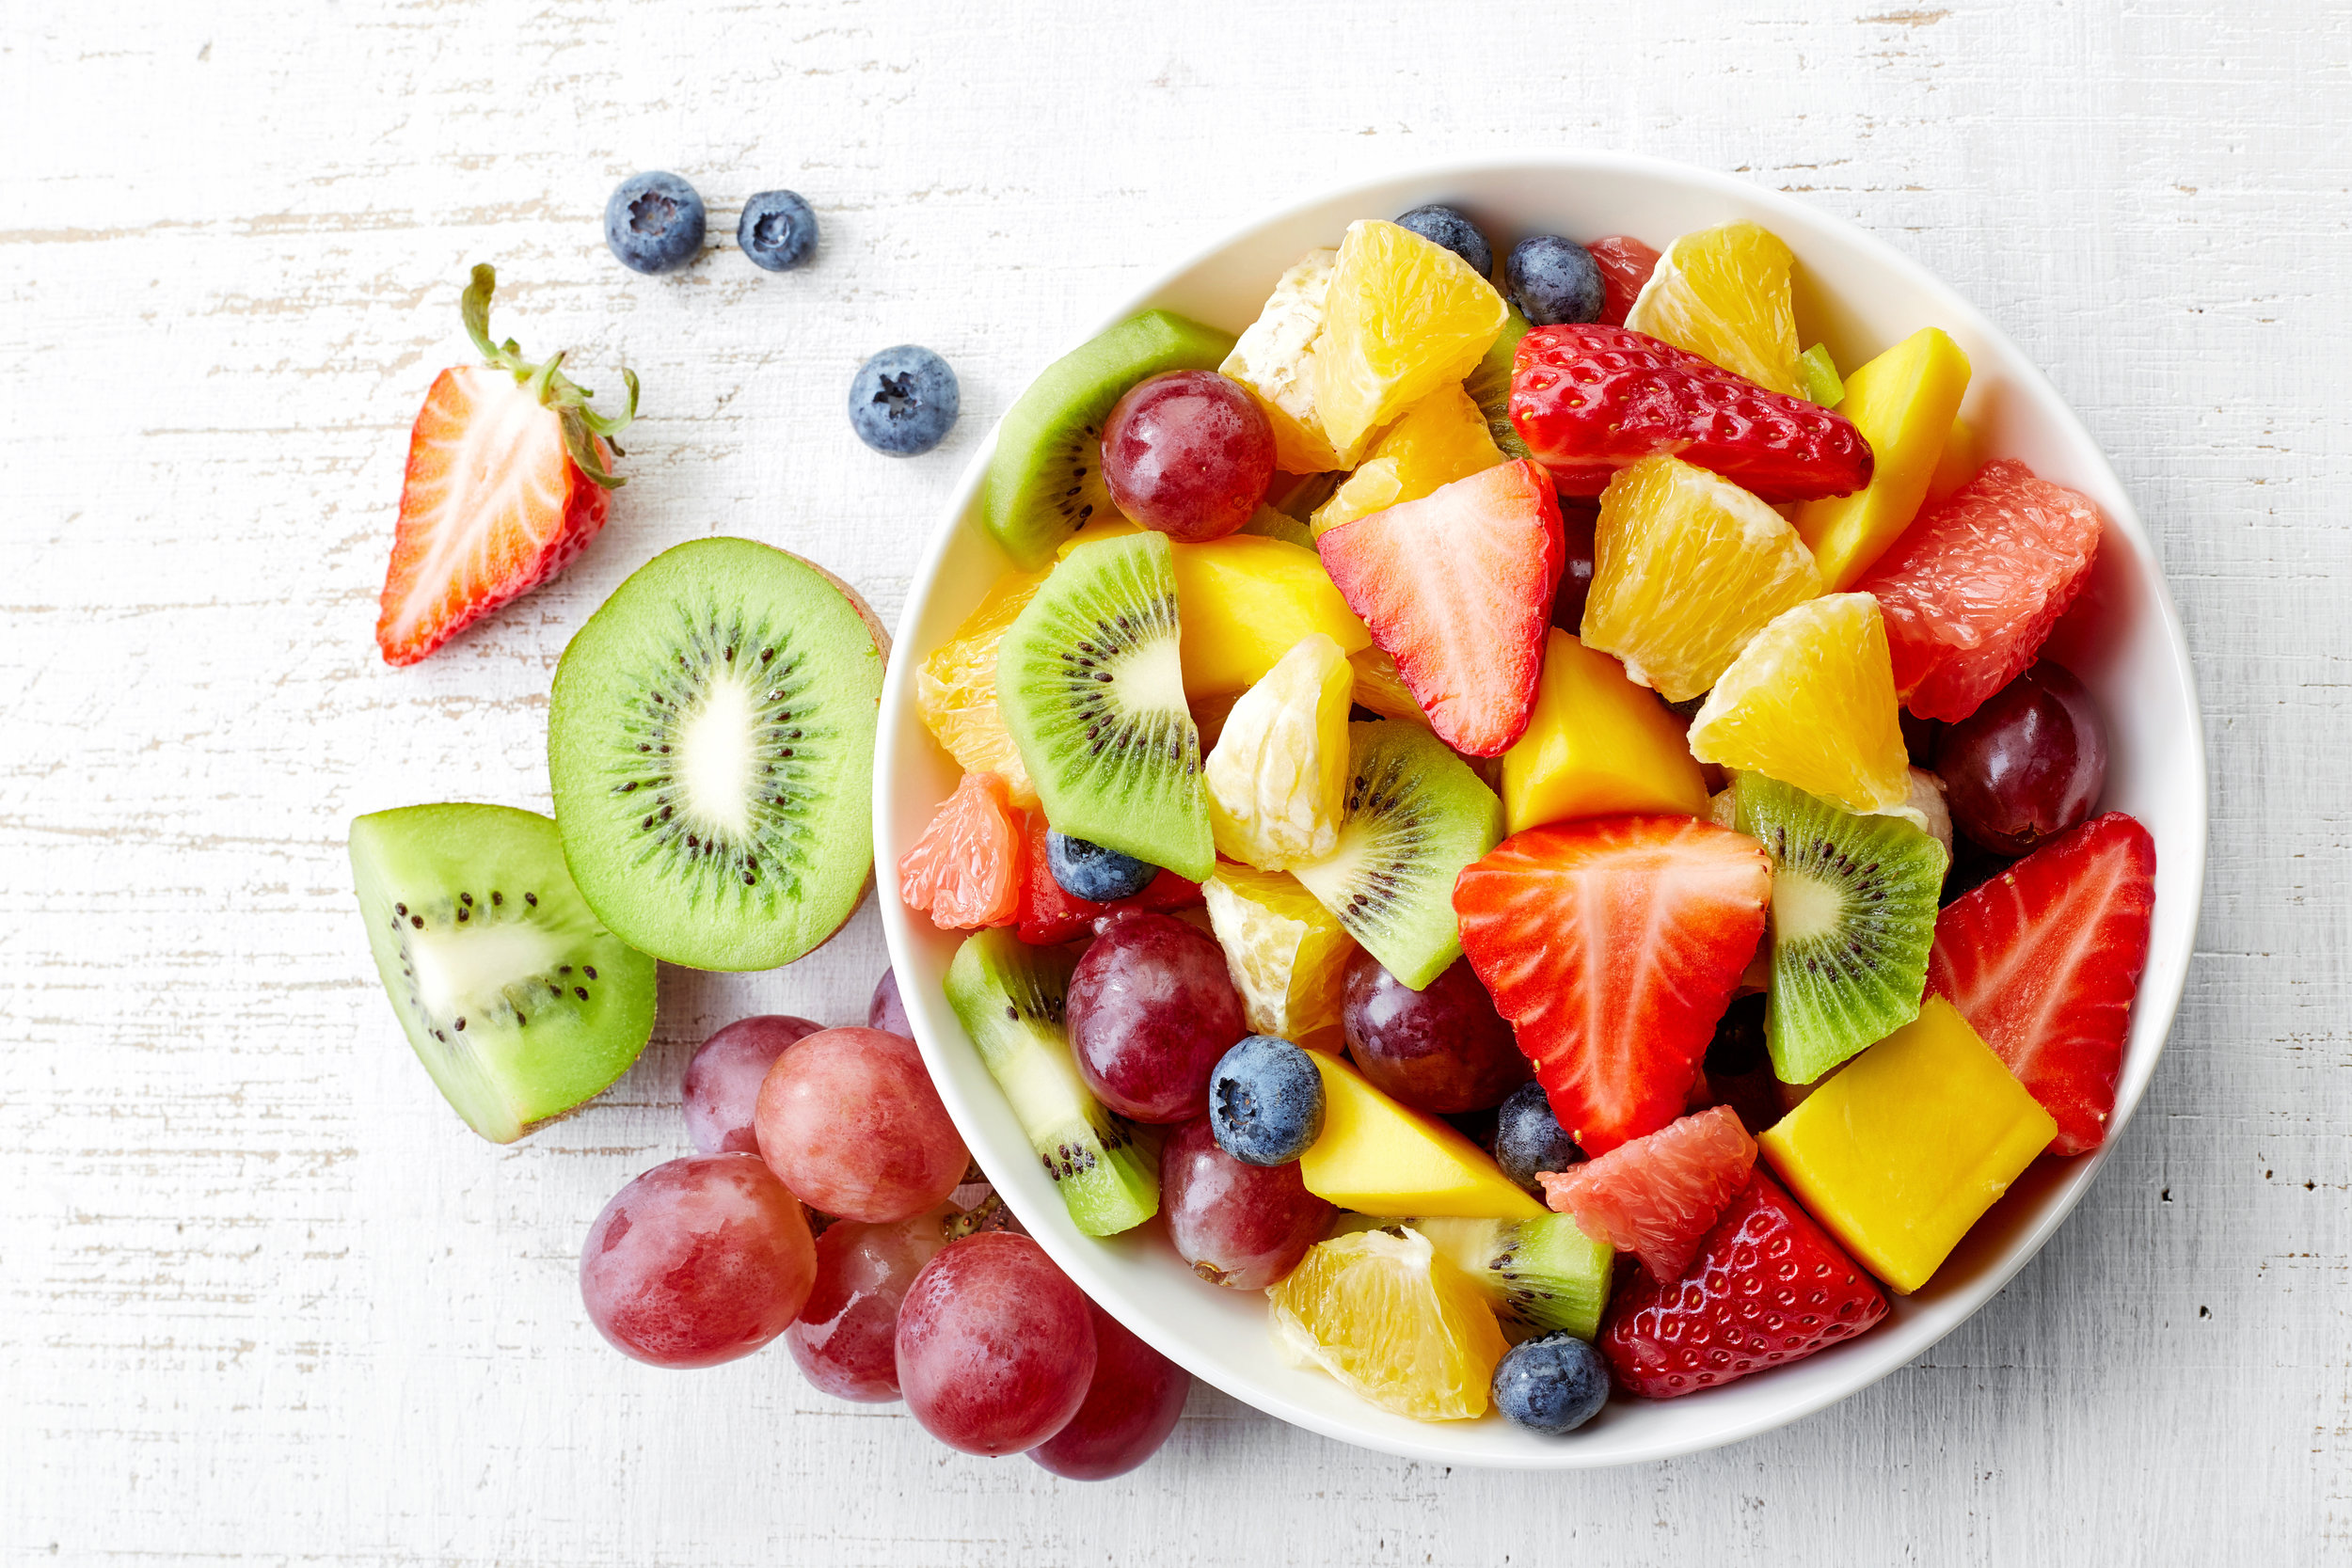 Seasonal Fruits & Berries